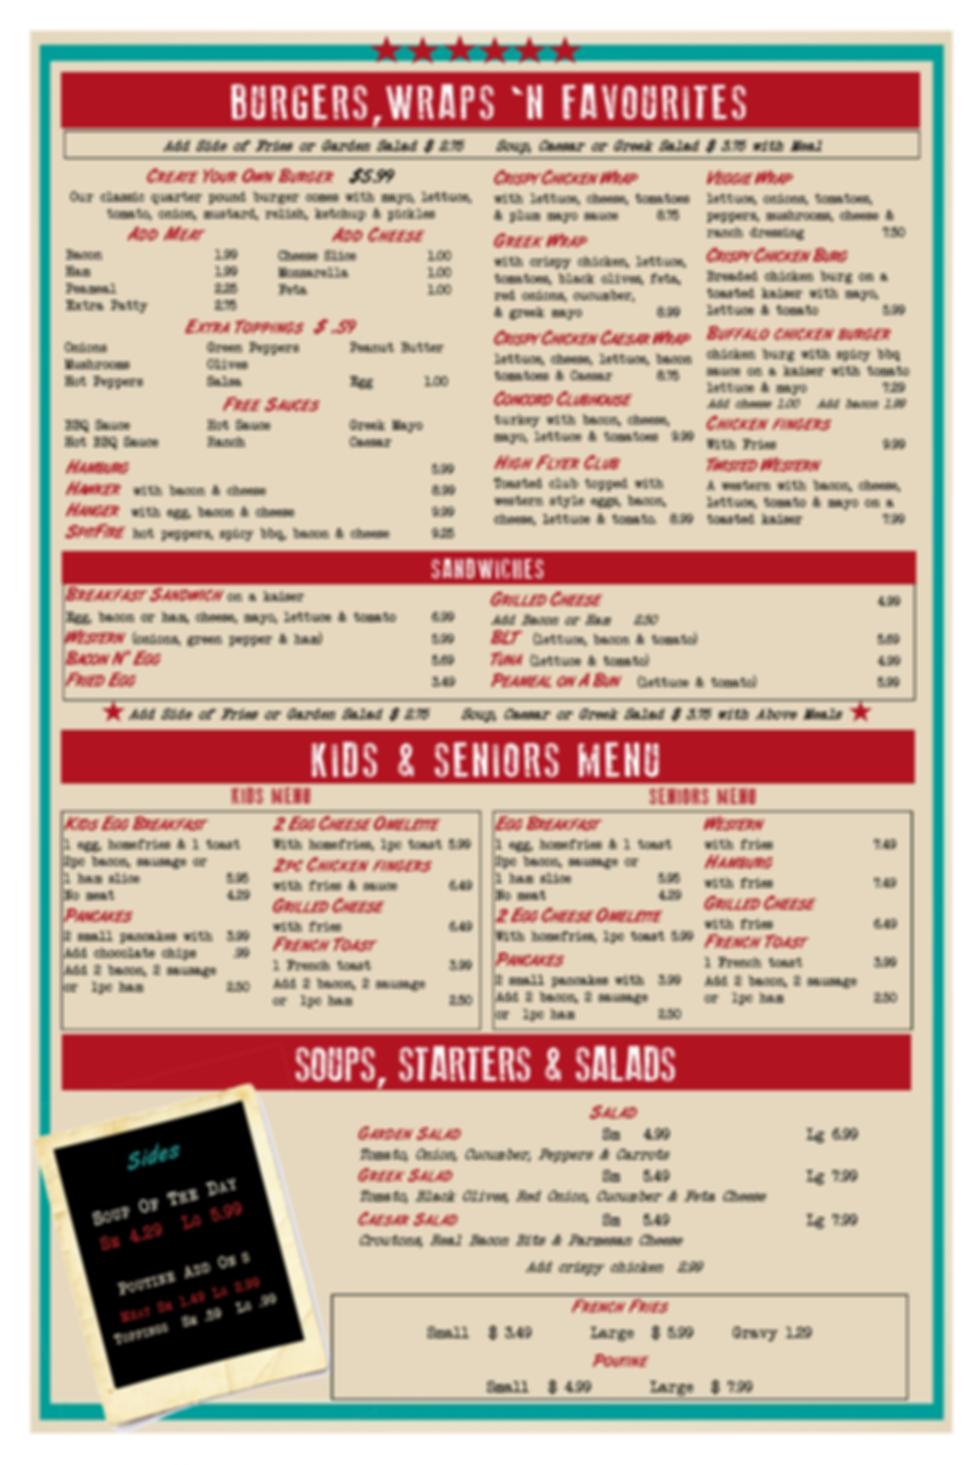 Brantford Lunch Menu1 2020.png